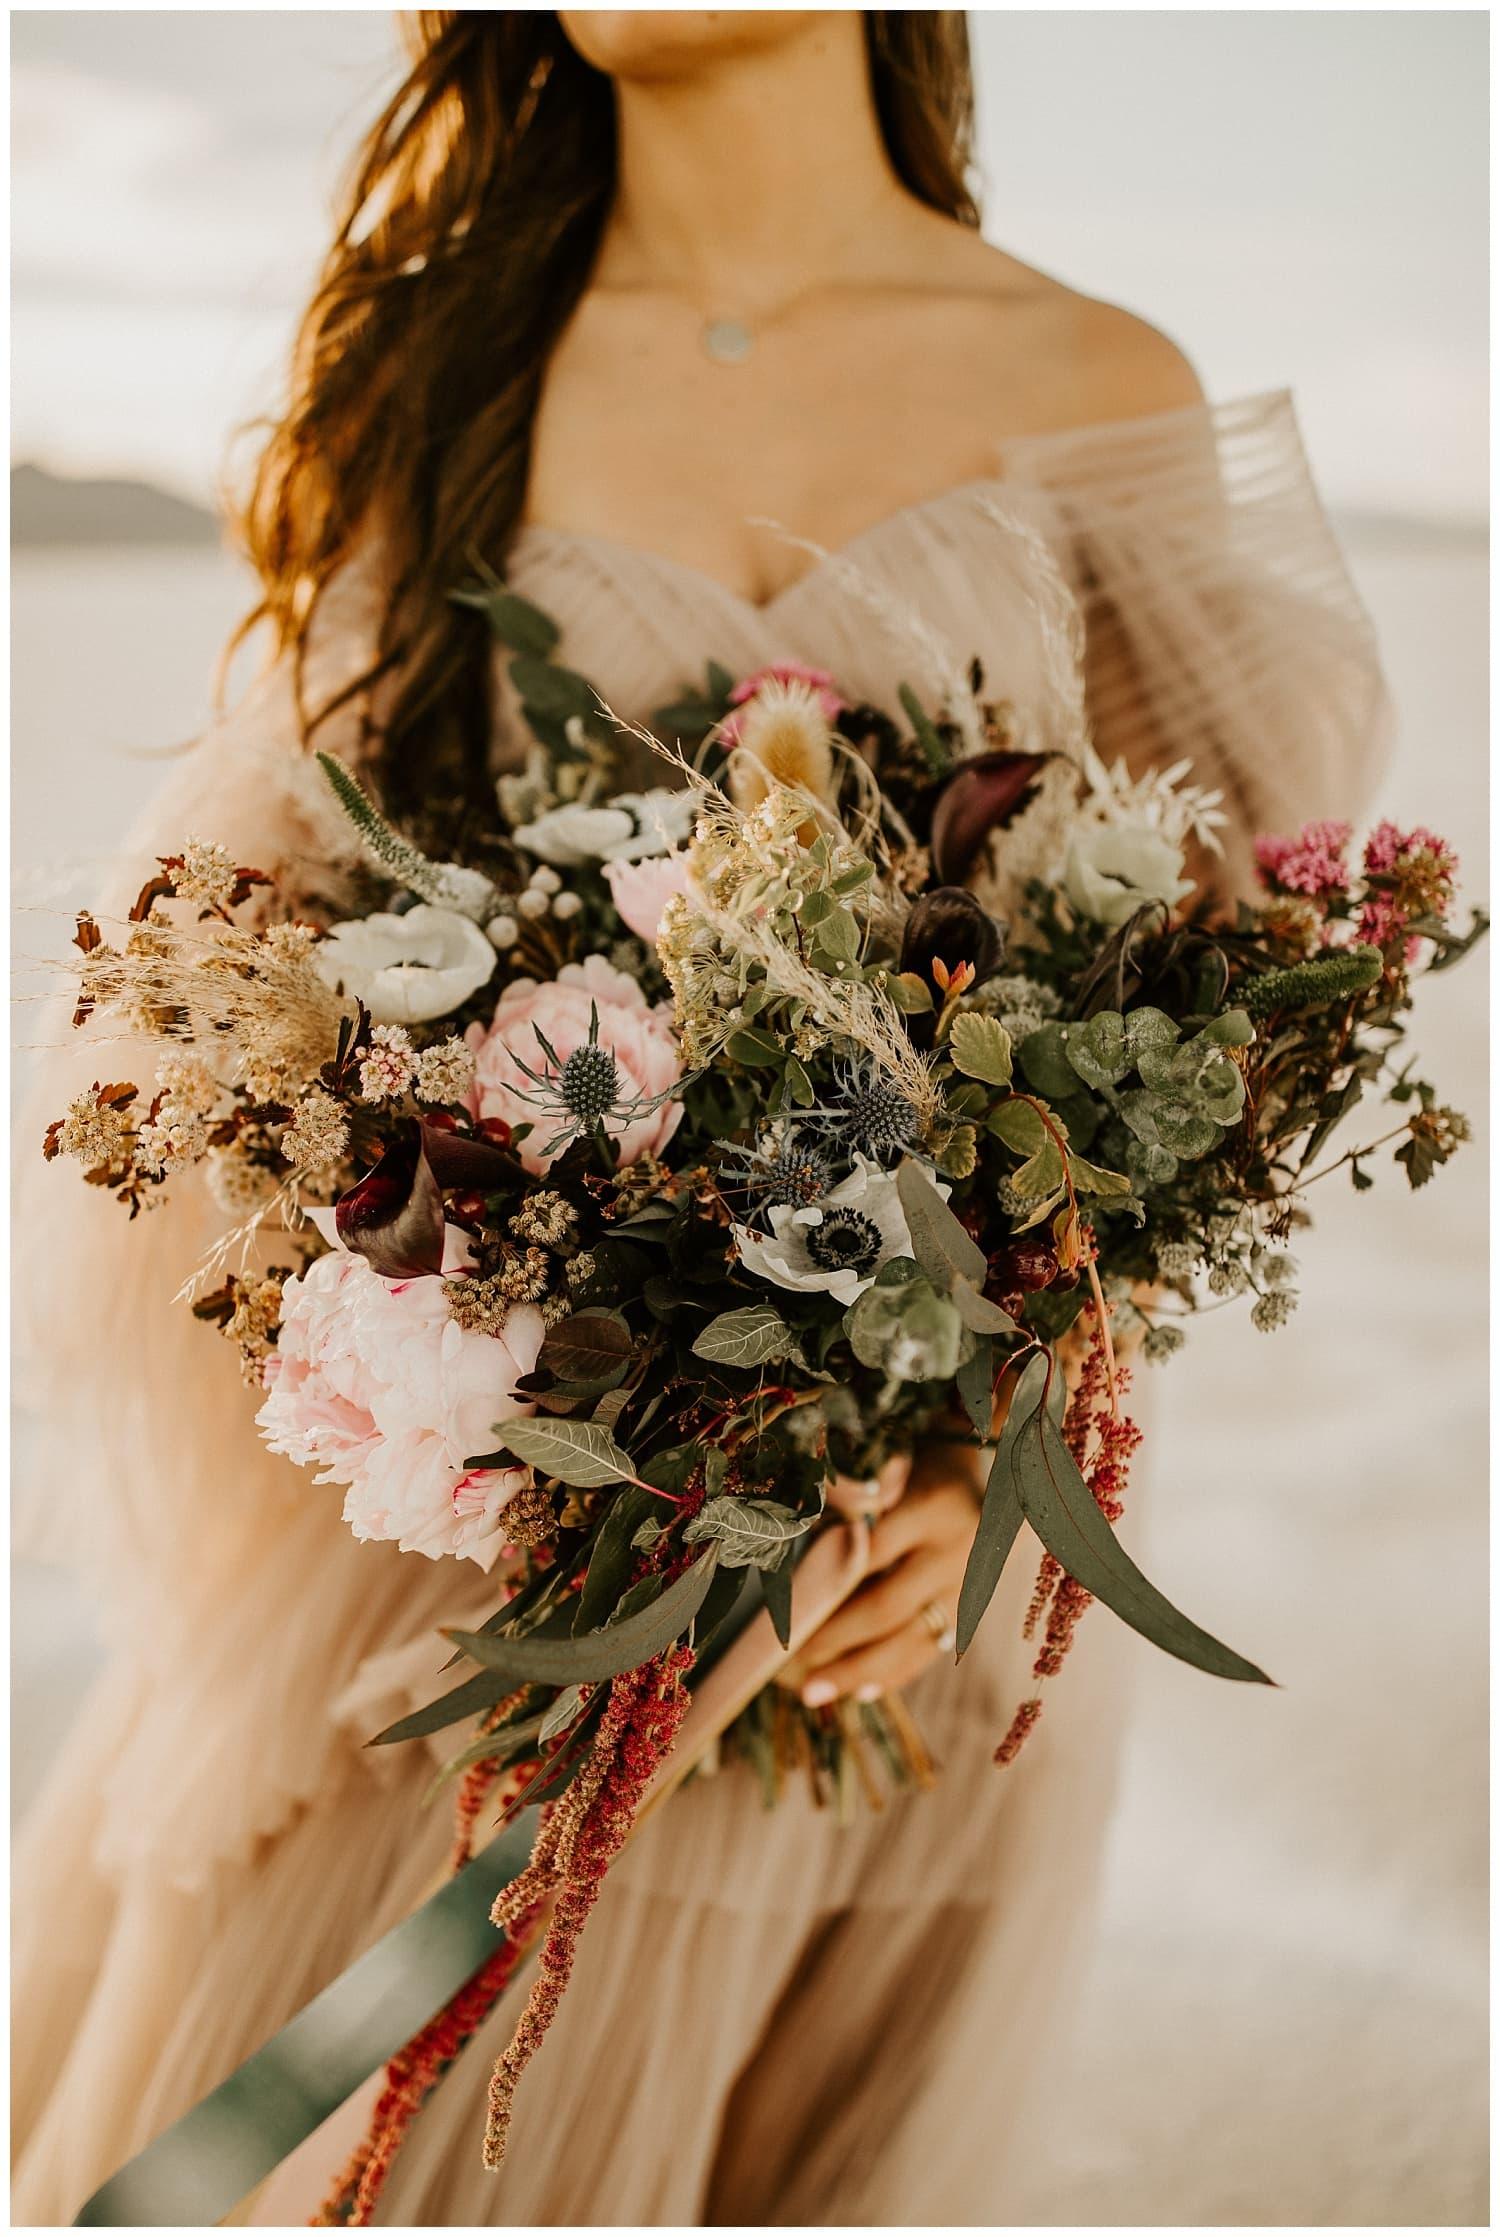 dreamy utah elopement, wedding photographers in utah, salt lake city photographers, wish blossom flowers